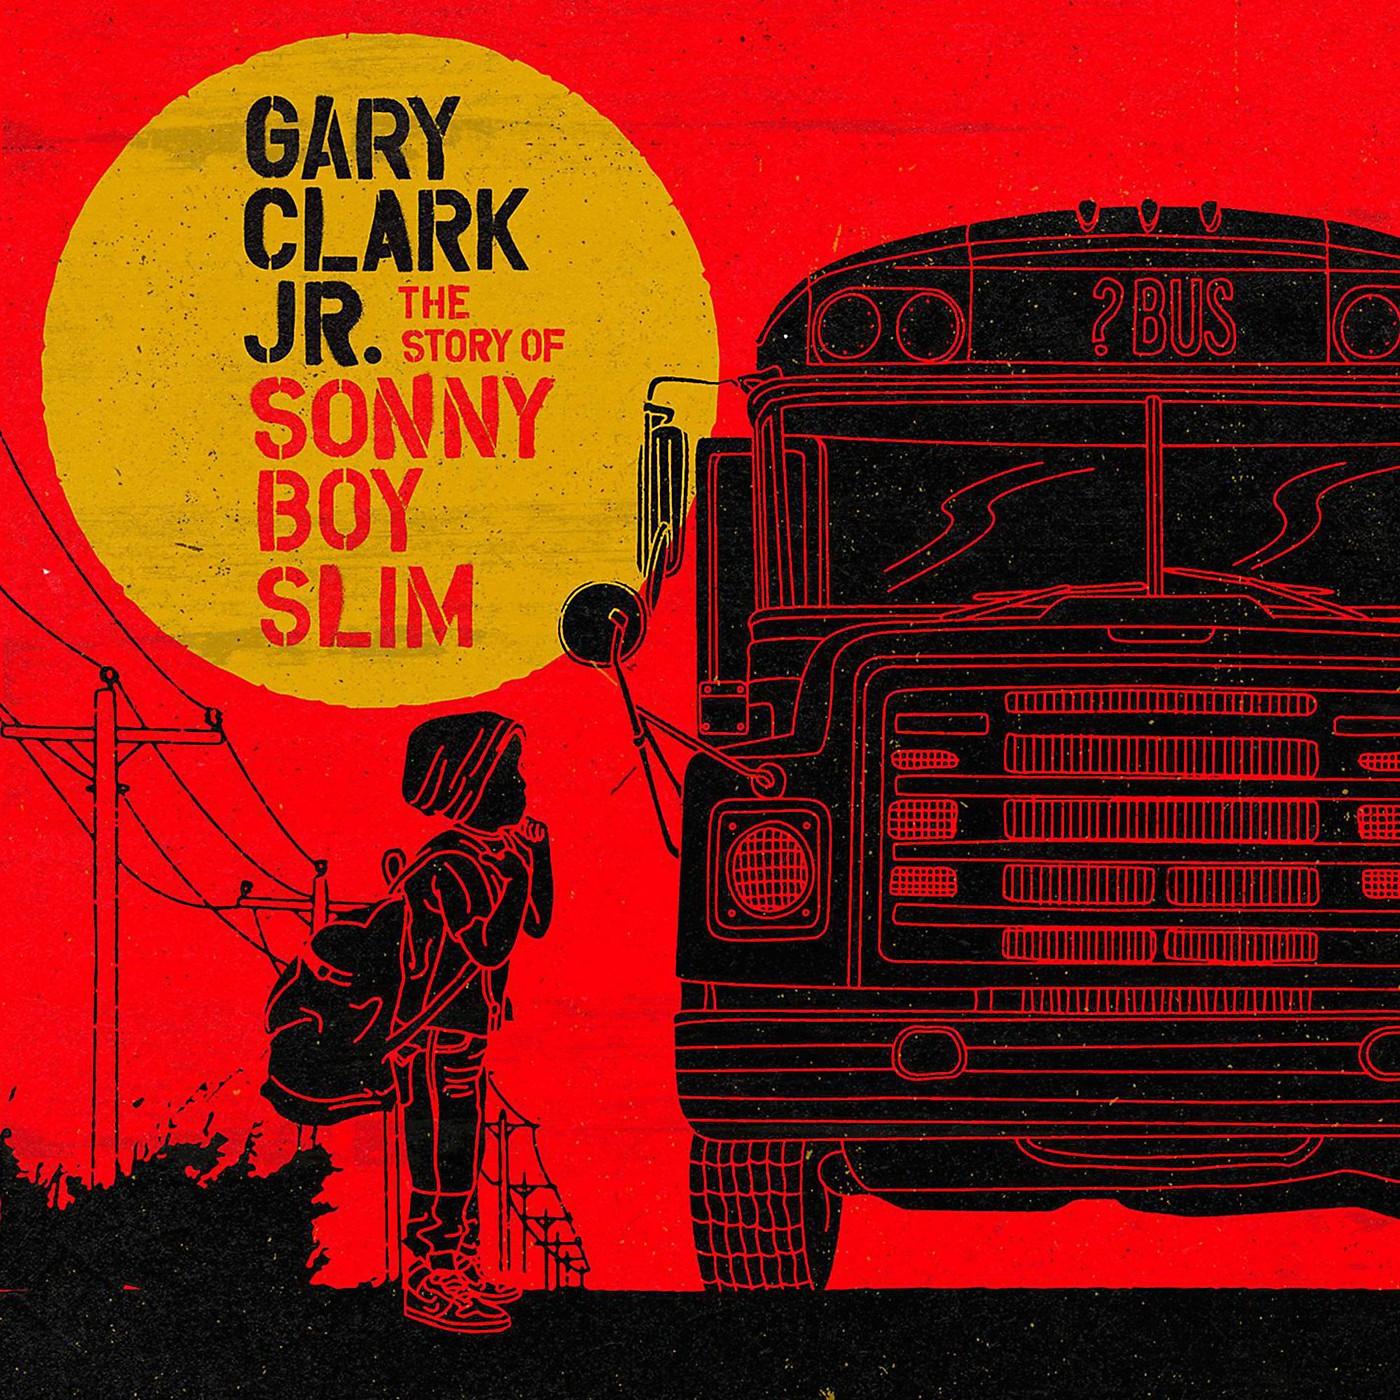 WEA Gary Clark Jr. - The Story of Sonny Boy Slim Vinyl LP thumbnail